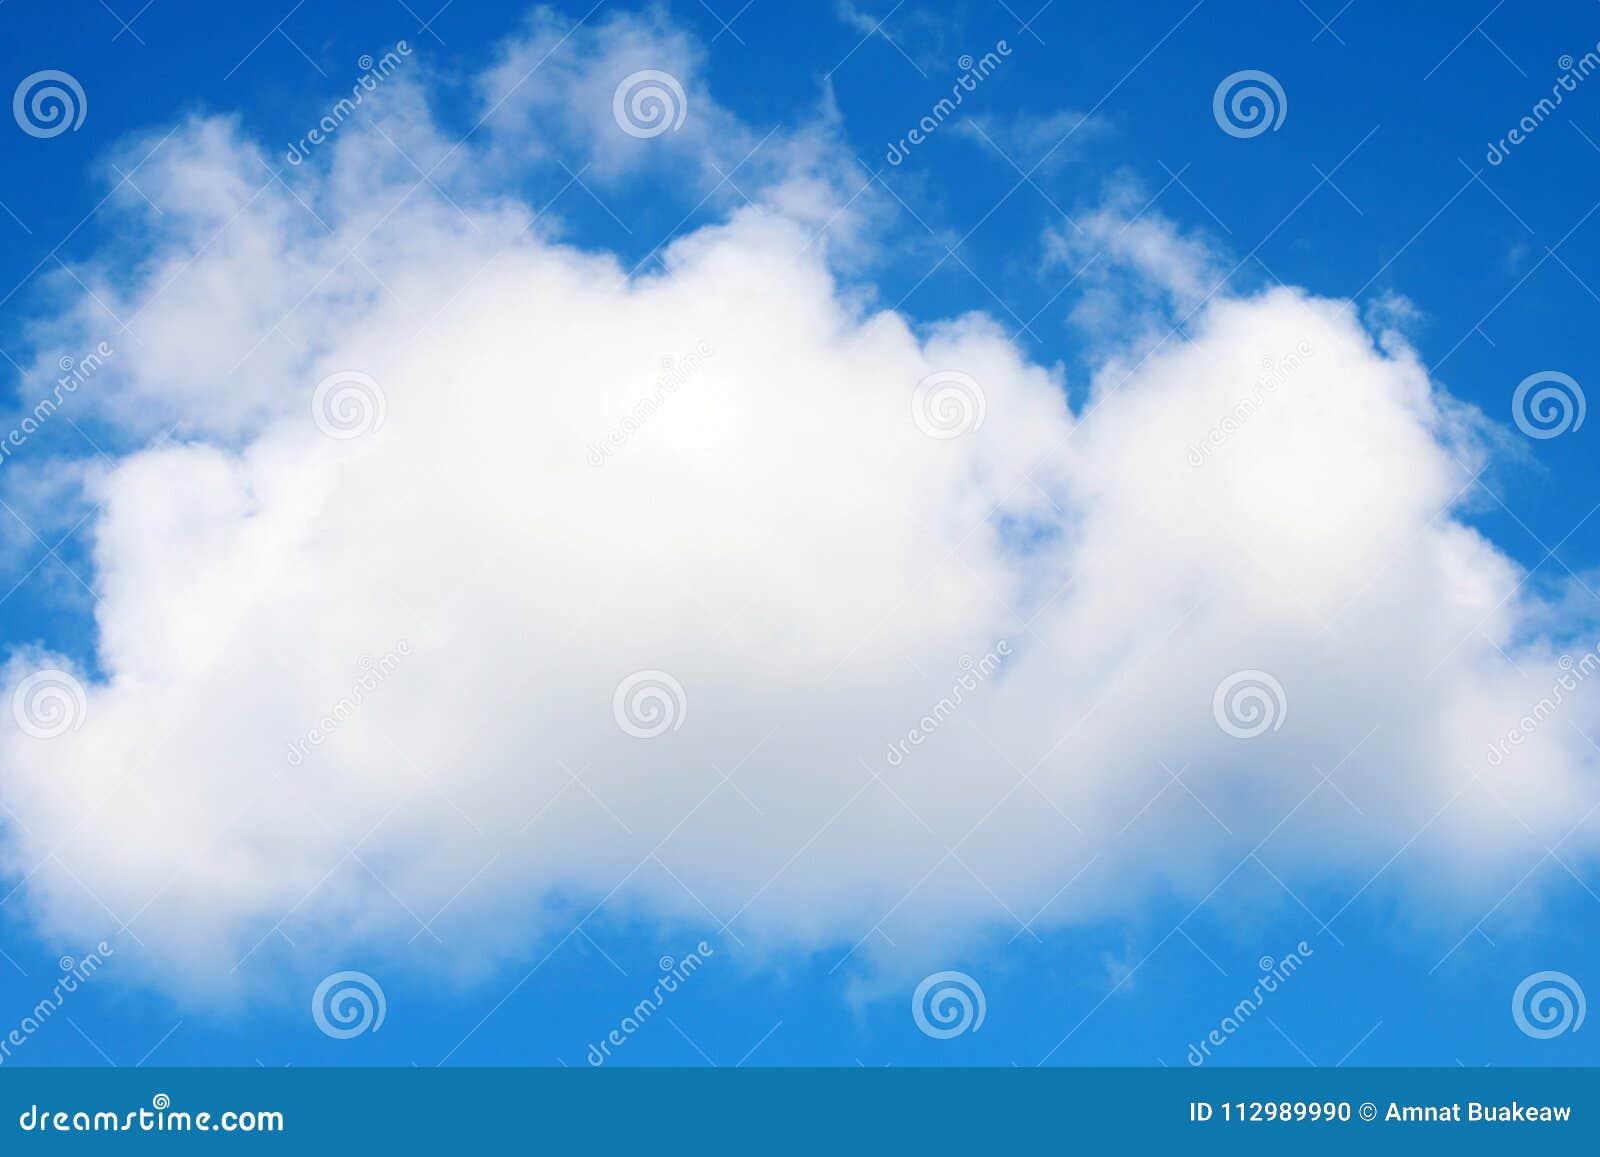 Sky, Big clouds beautiful on sky blue background